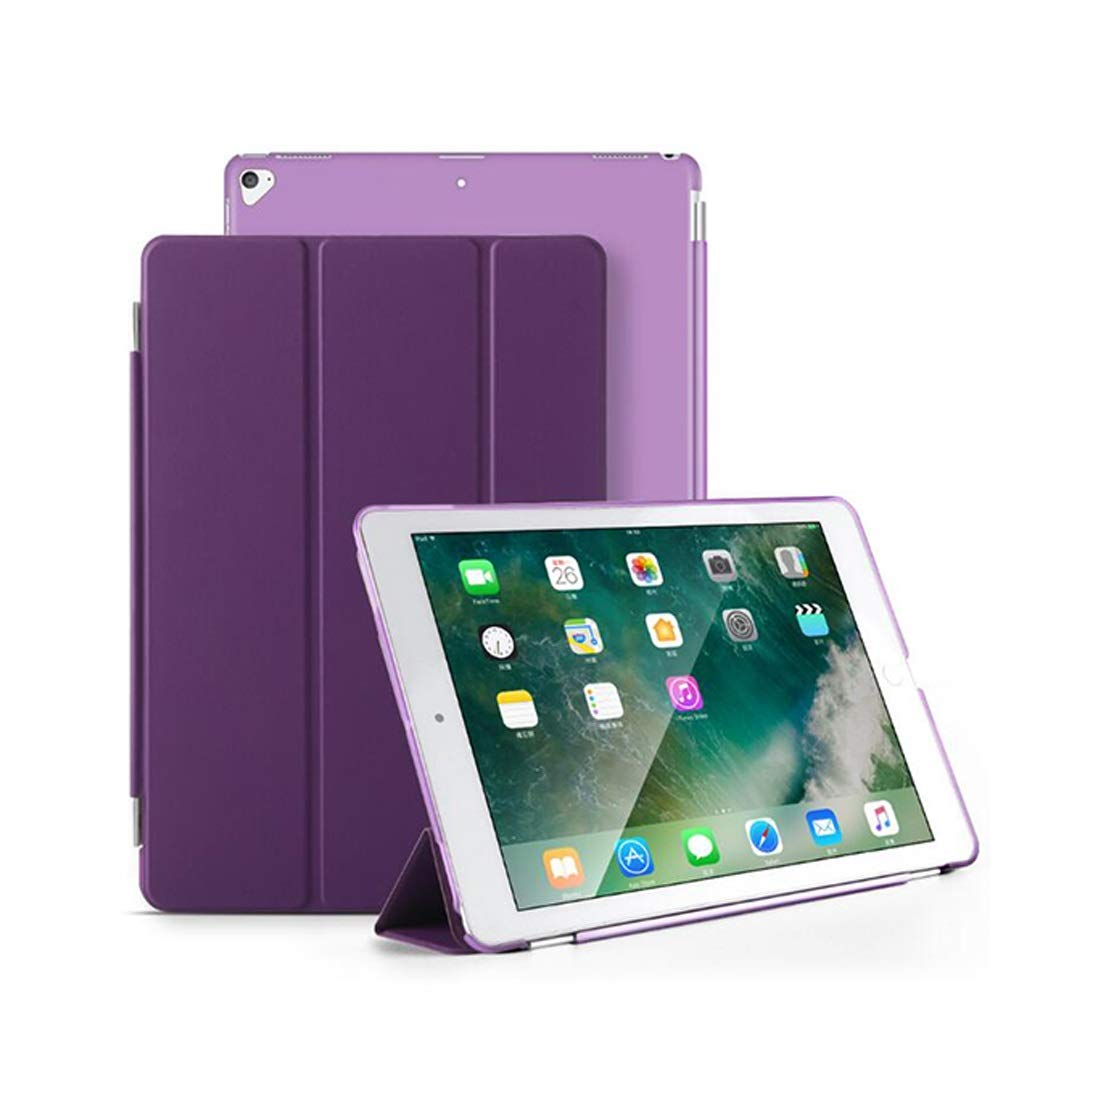 MATCHANT ケース Apple iPad Pro 12.9対応 - スリム軽量スマートシェルスタンドカバー 半透明つや消しバックプロテクター付き Apple iPad Pro 12.9インチ 2017 & 2015タブレット対応 パープル MATCHANT  パープル B07LD81J8W